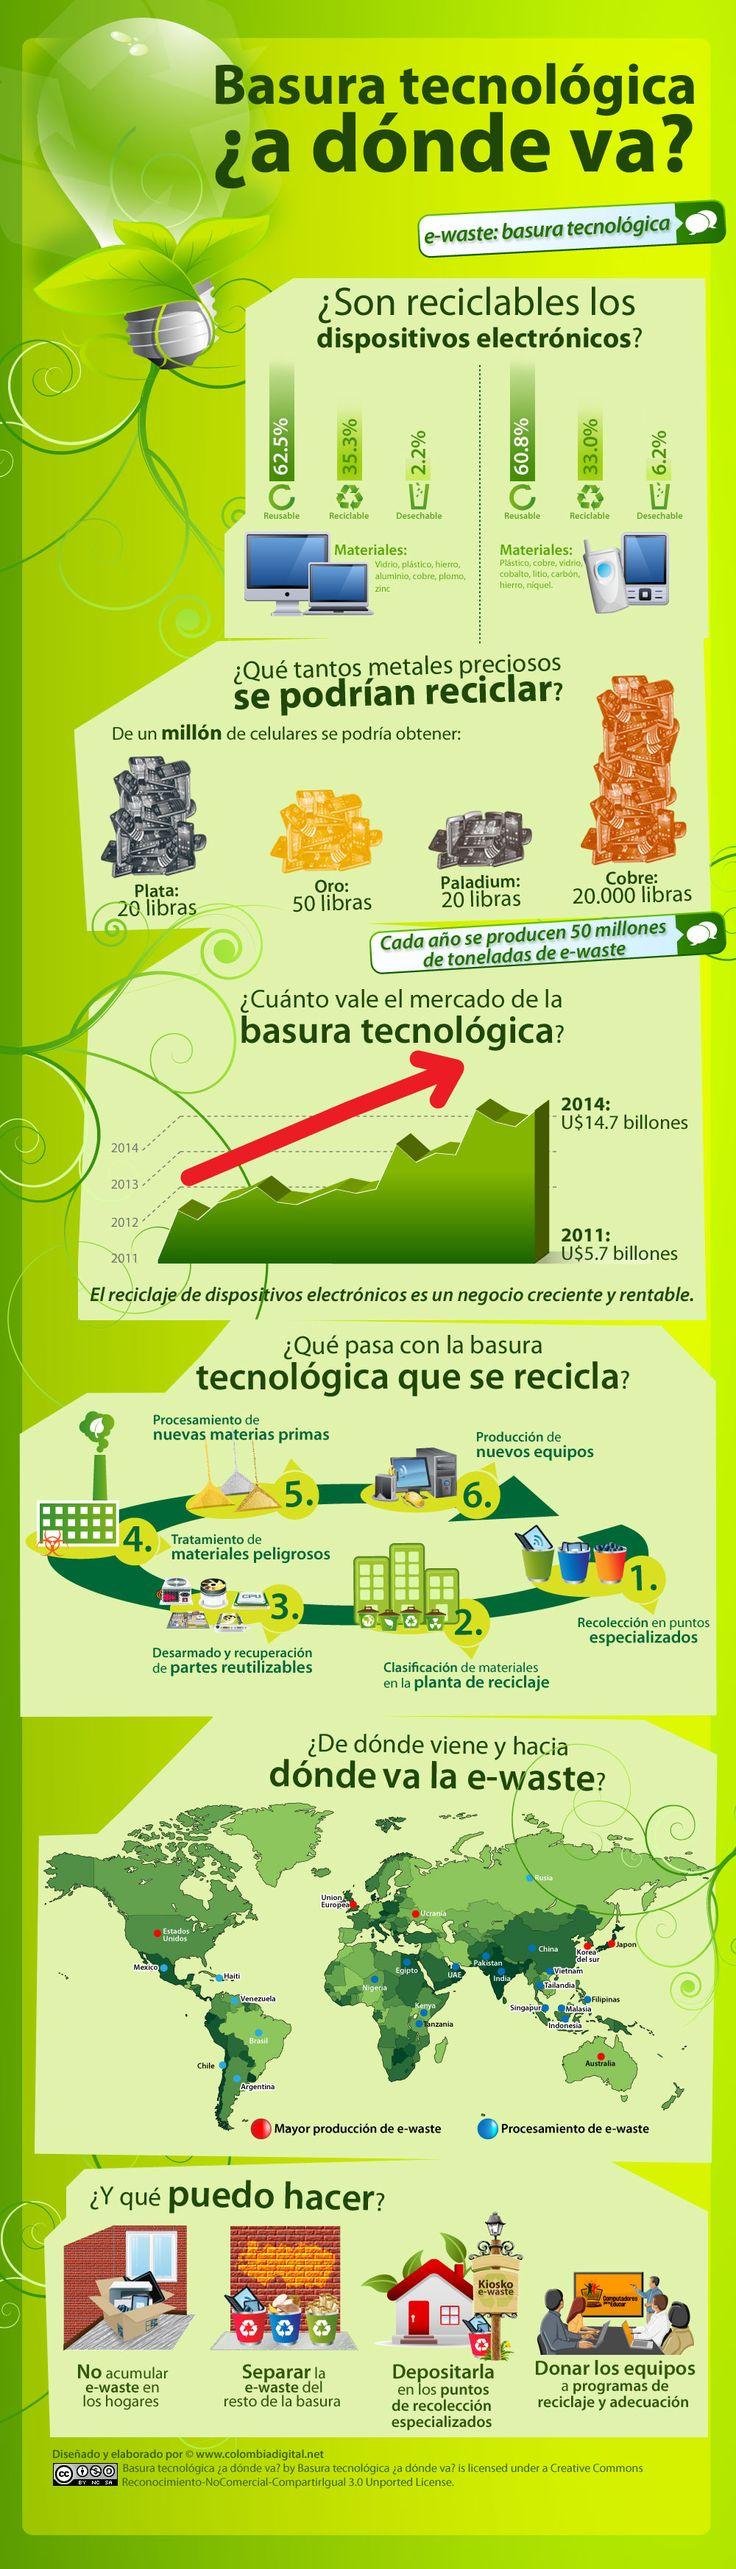 Basura tecnológica ¿ a donde va? #infografia #infographic #medioambiente